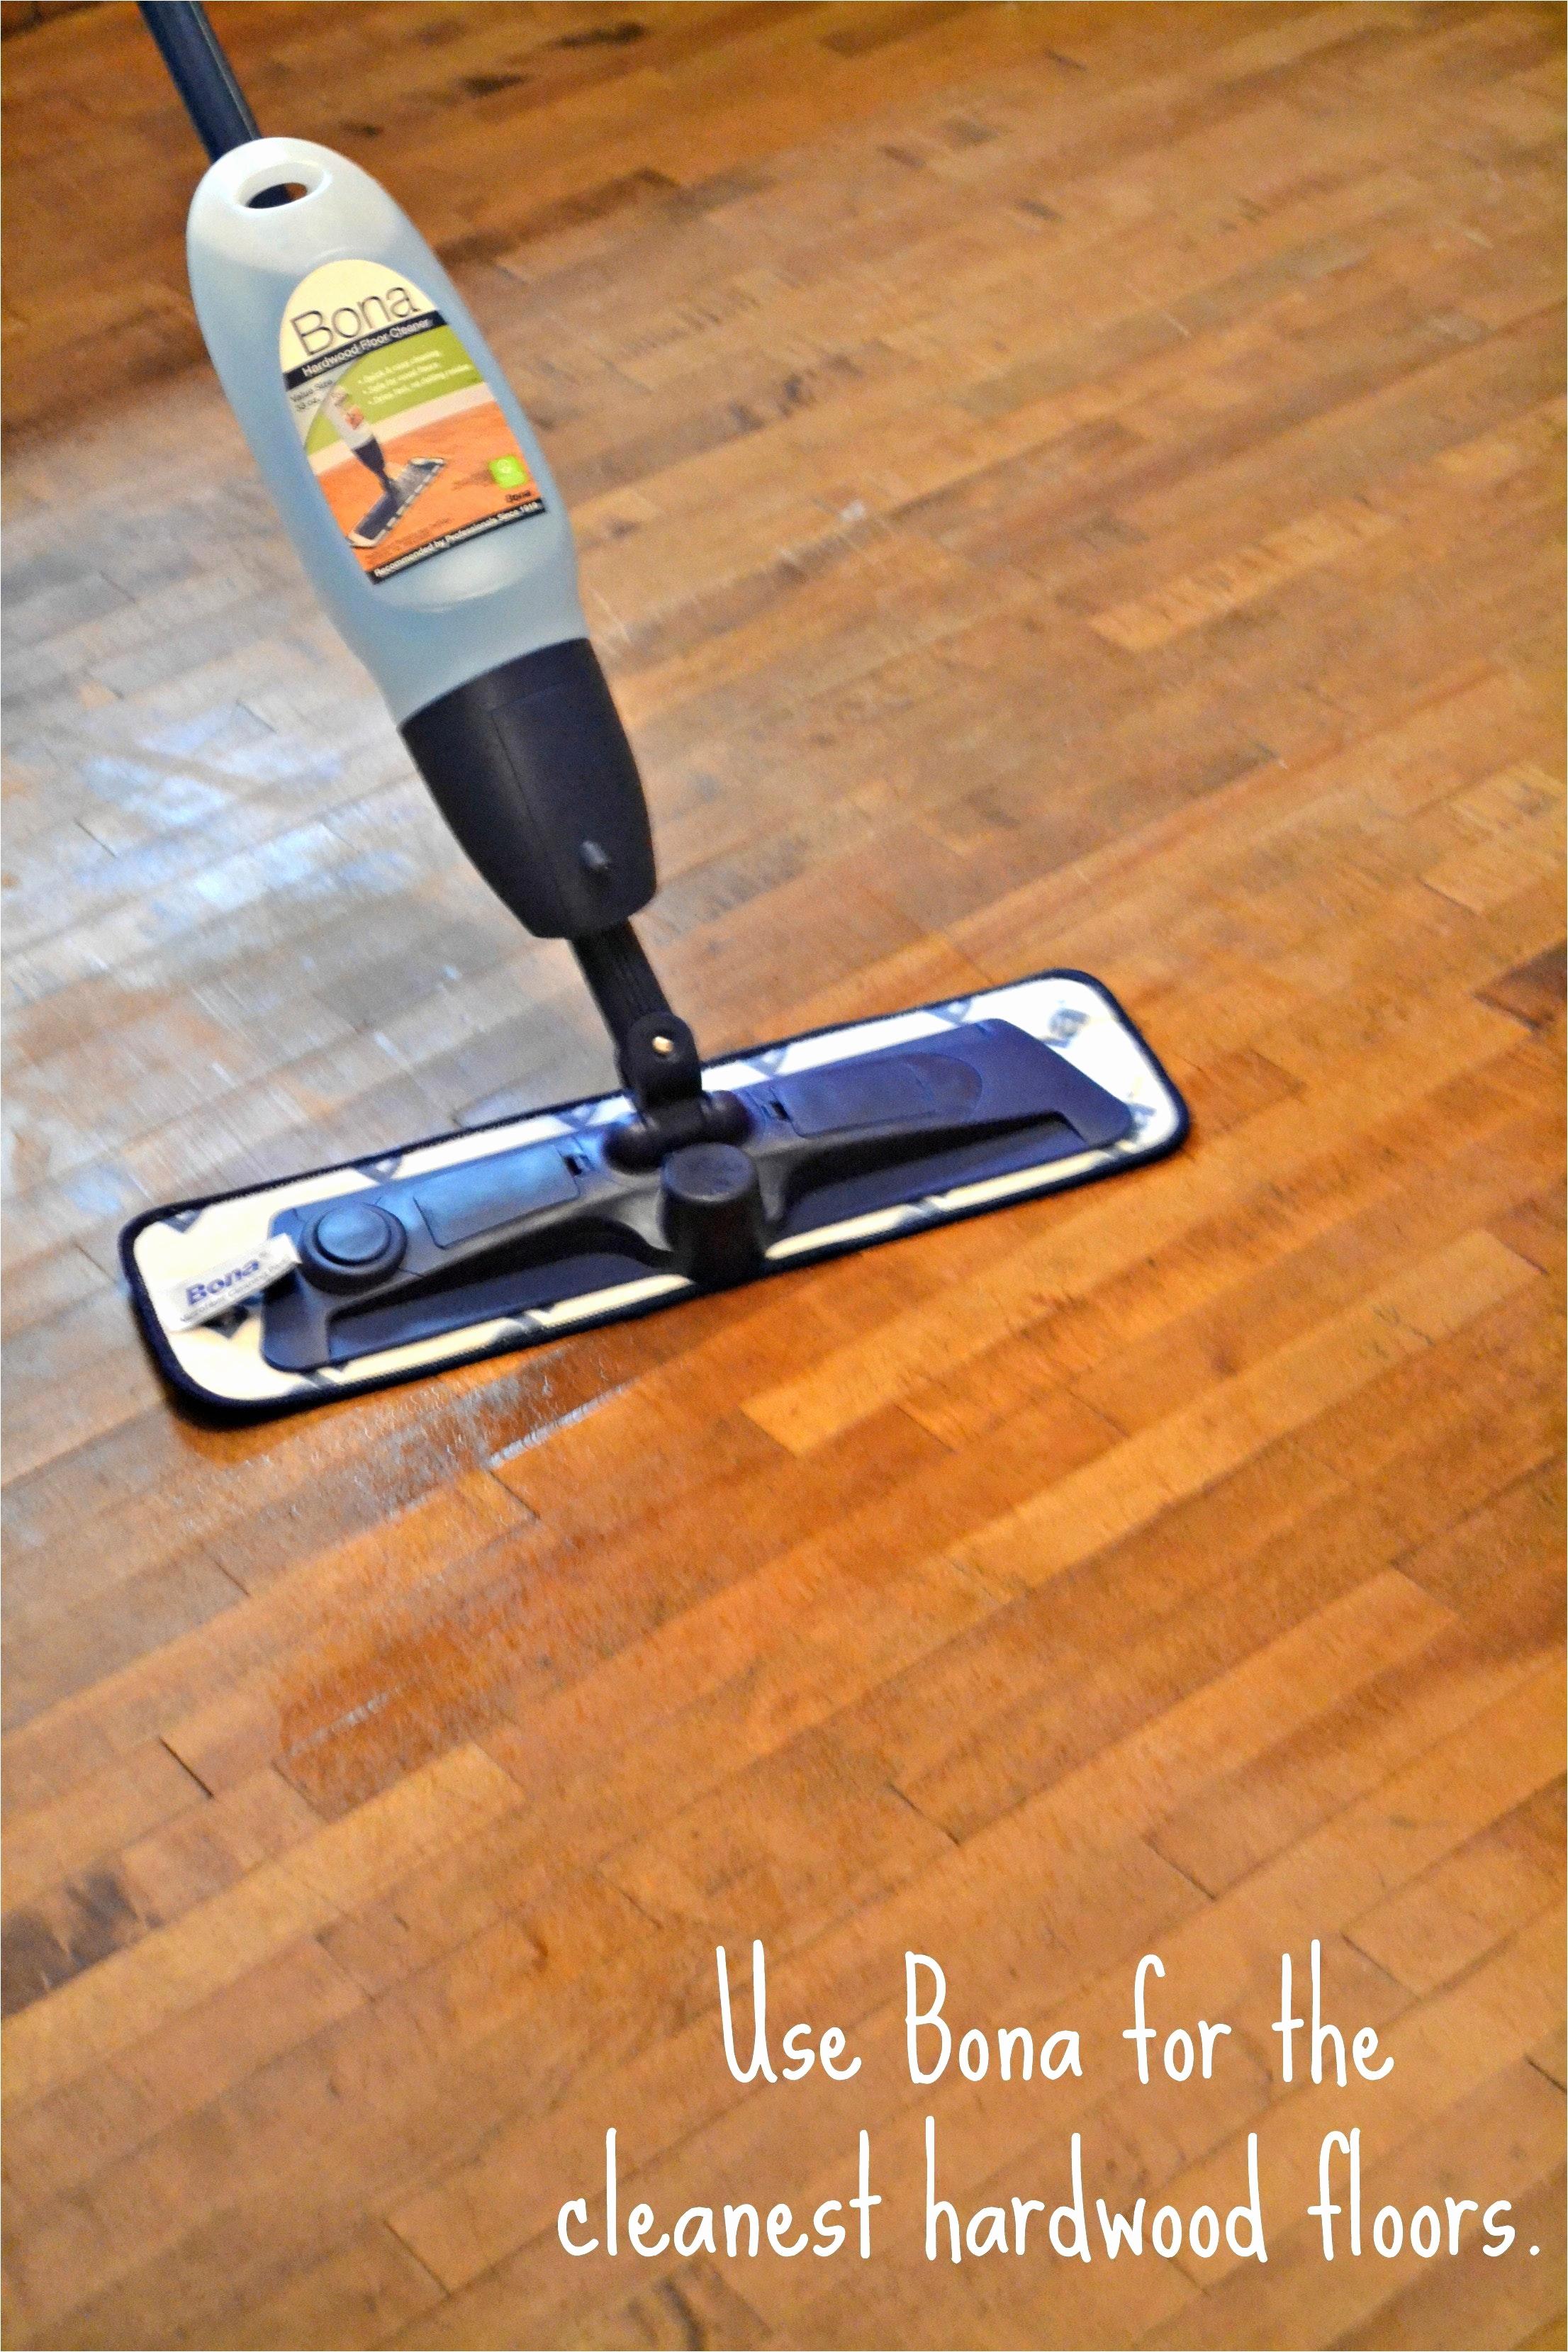 bona x hardwood floor cleaner reviews of 46 elegant the best of bona hardwood floor mop laminate mobel within bona hardwood floor mop laminate elegant shark hardwood floor cleaner costco